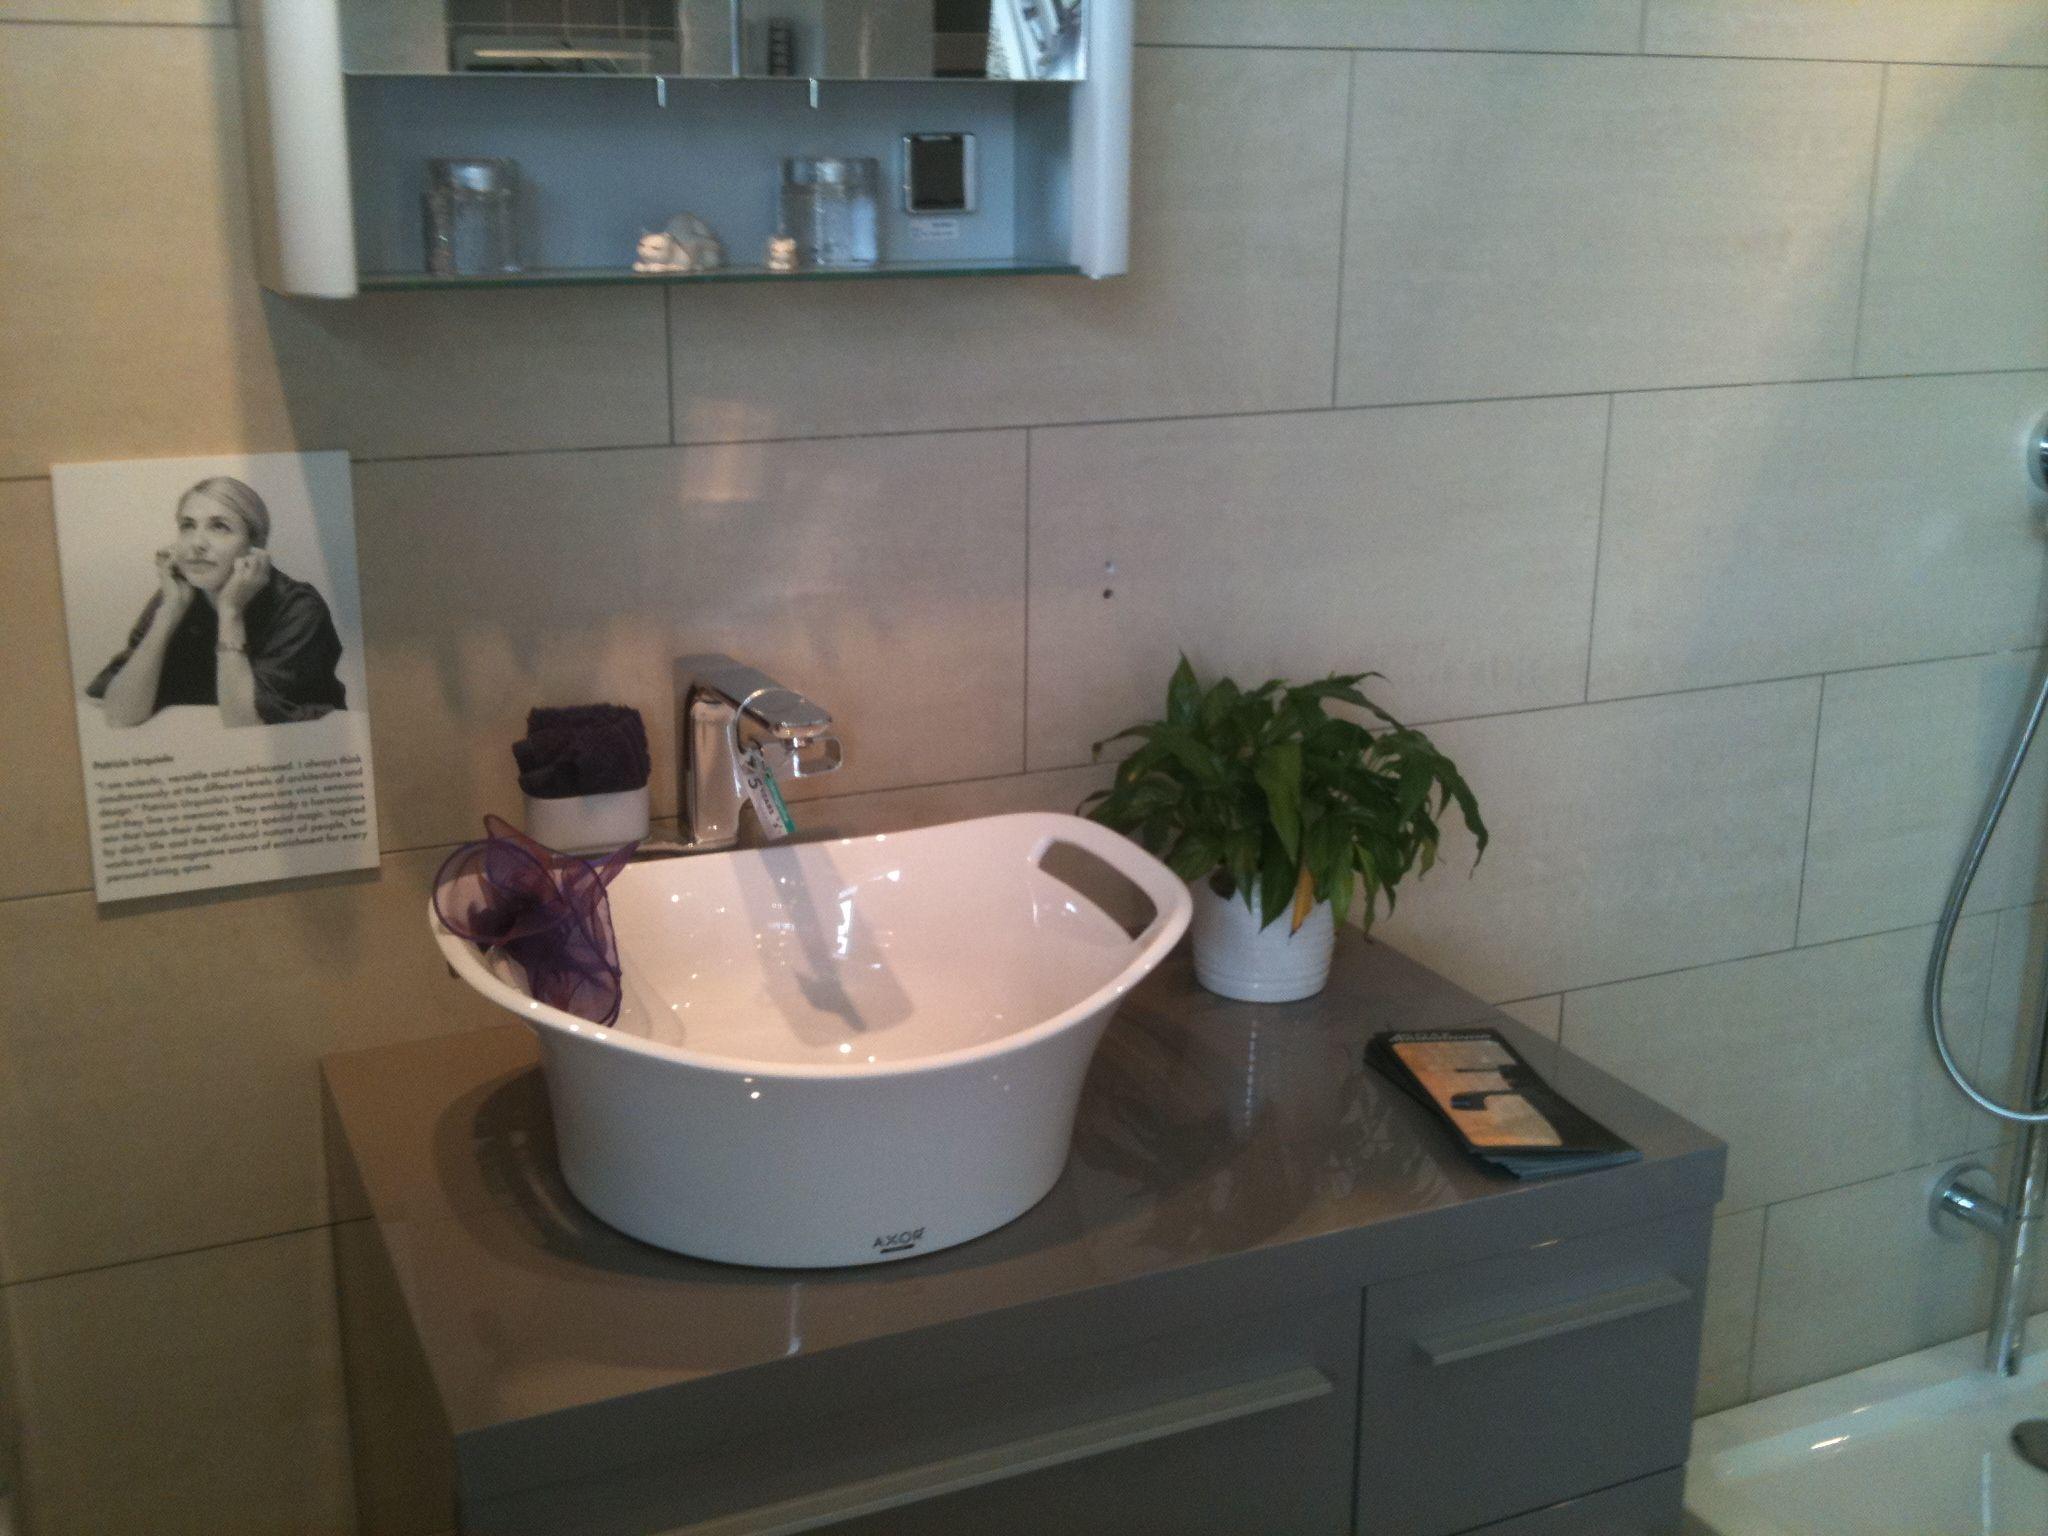 Badkamer Axor Urquiola : Axor urquiola basin with basin taps on duravit large furniture